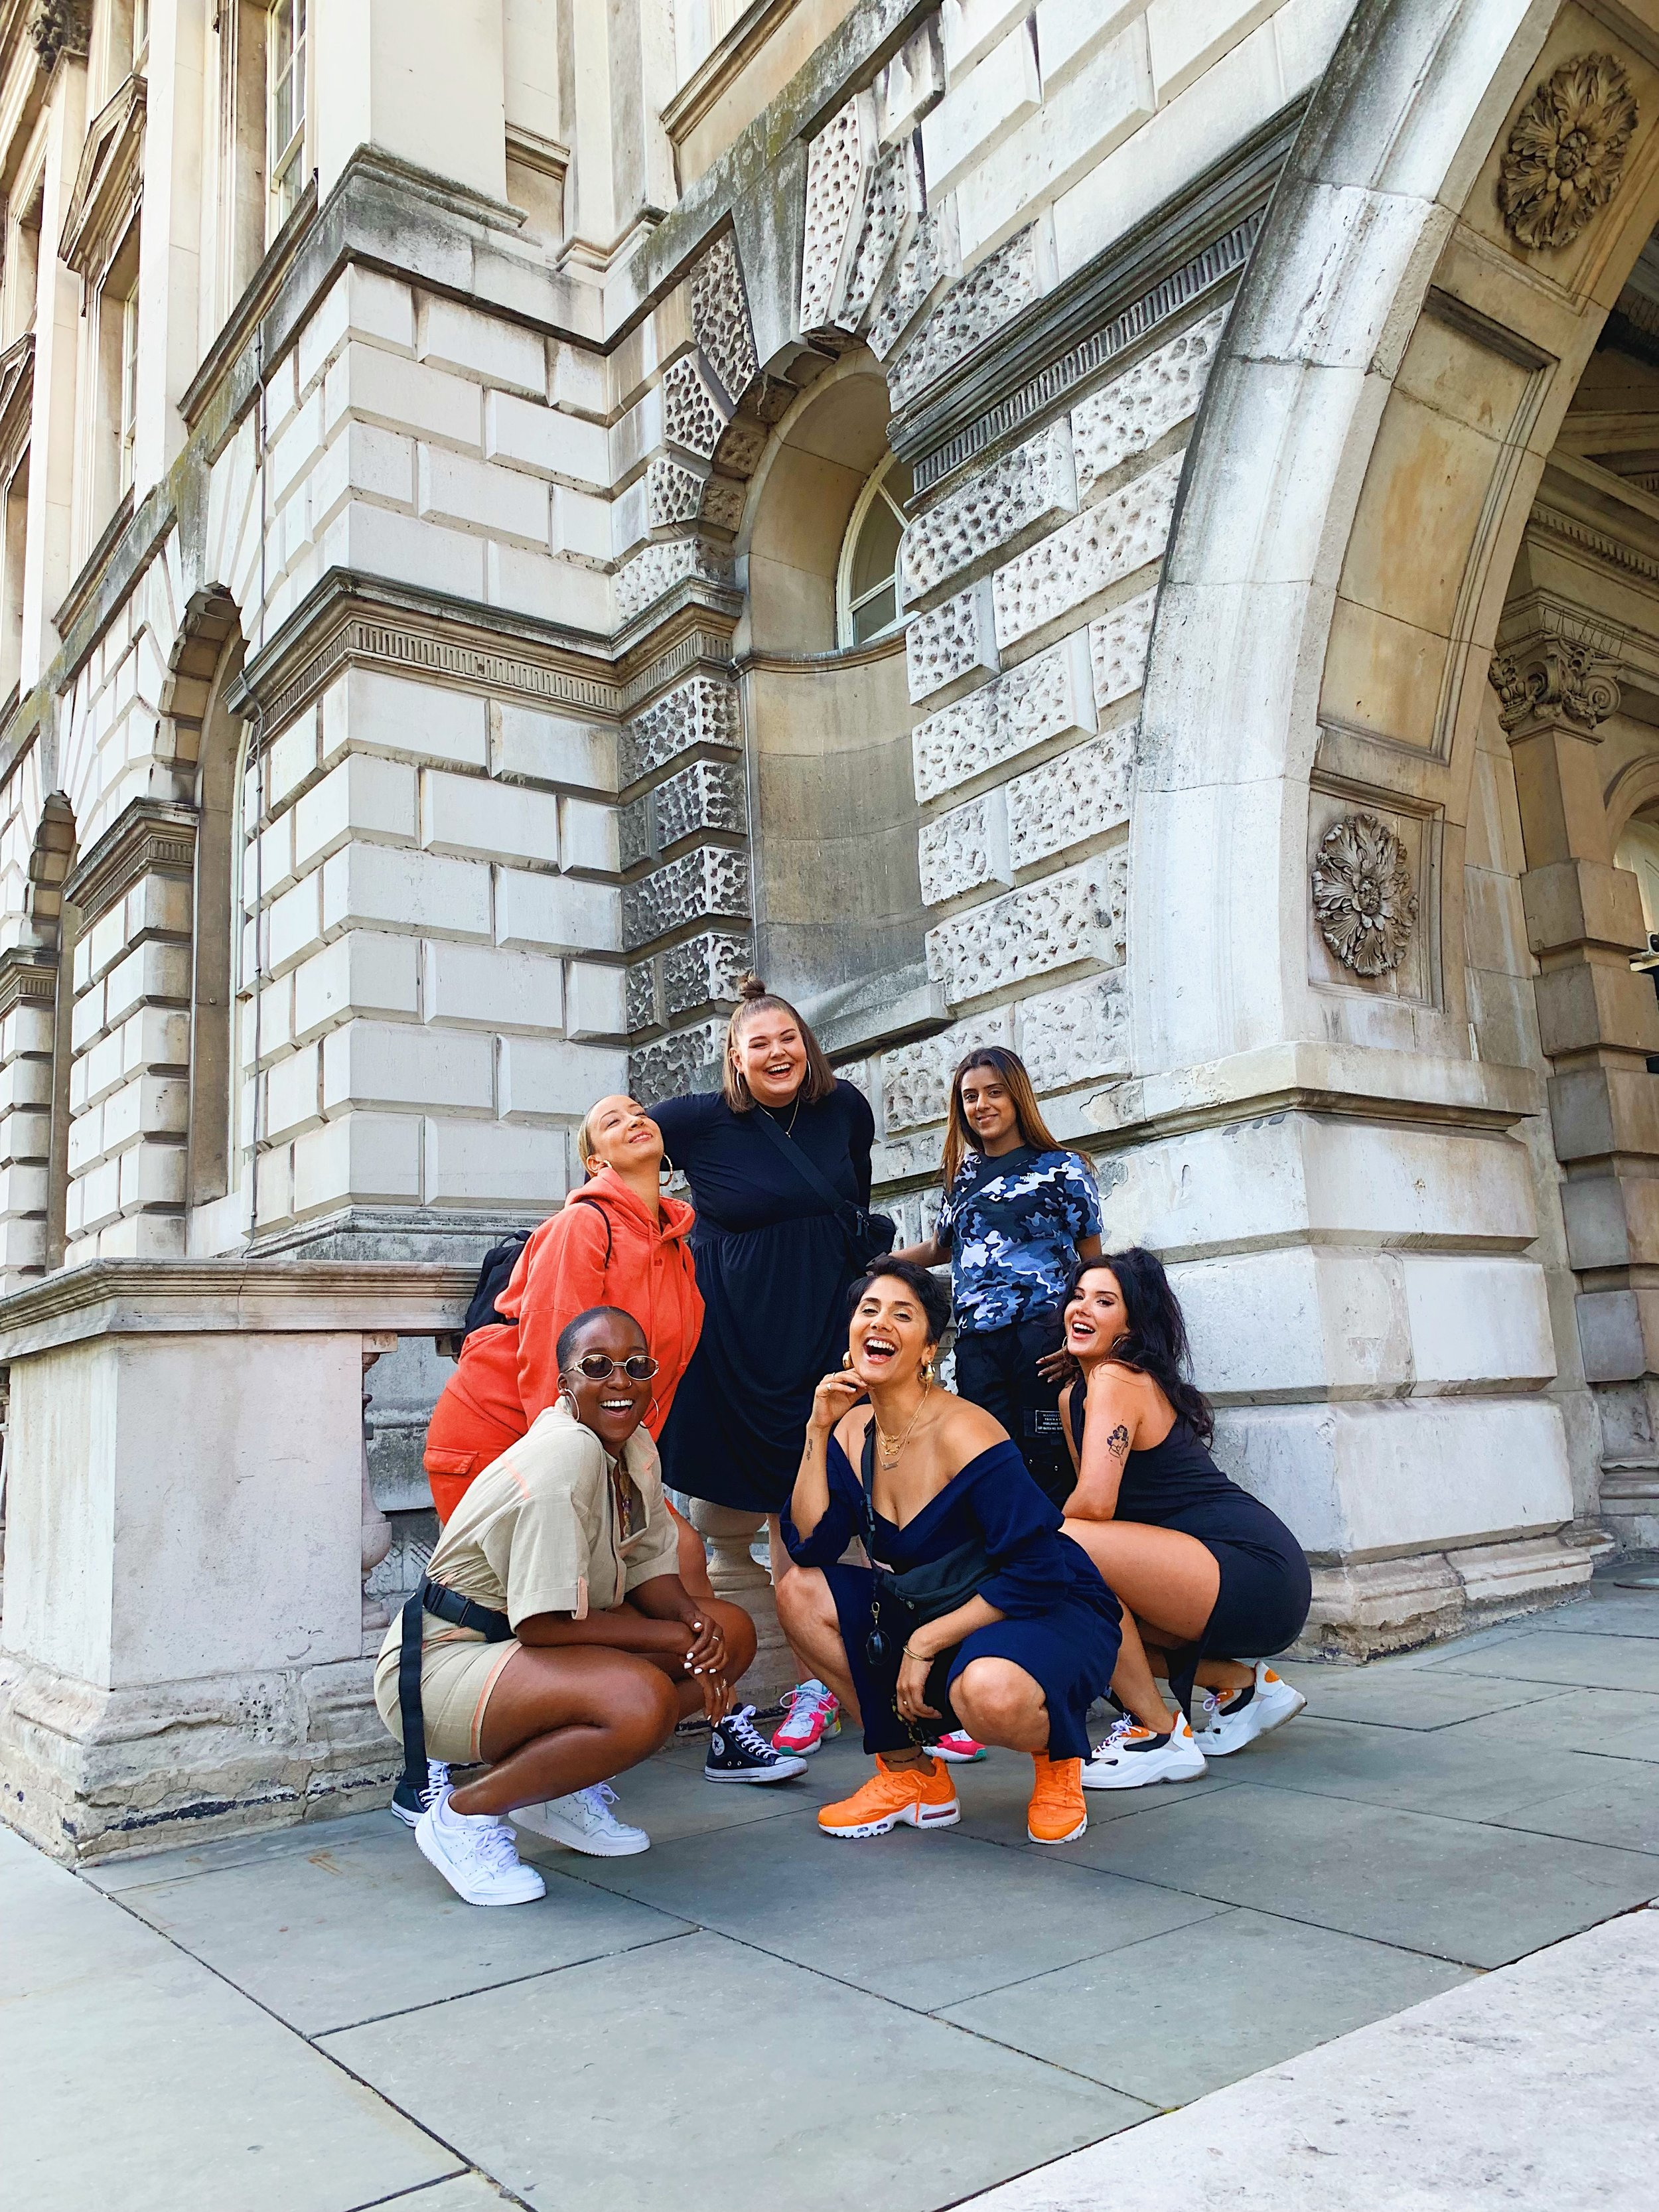 Antonia Odunlami, Rebecca Judd, Almass Badat, Shivani + Jessica Murphy at Somerset House: Summer Series with Soulection